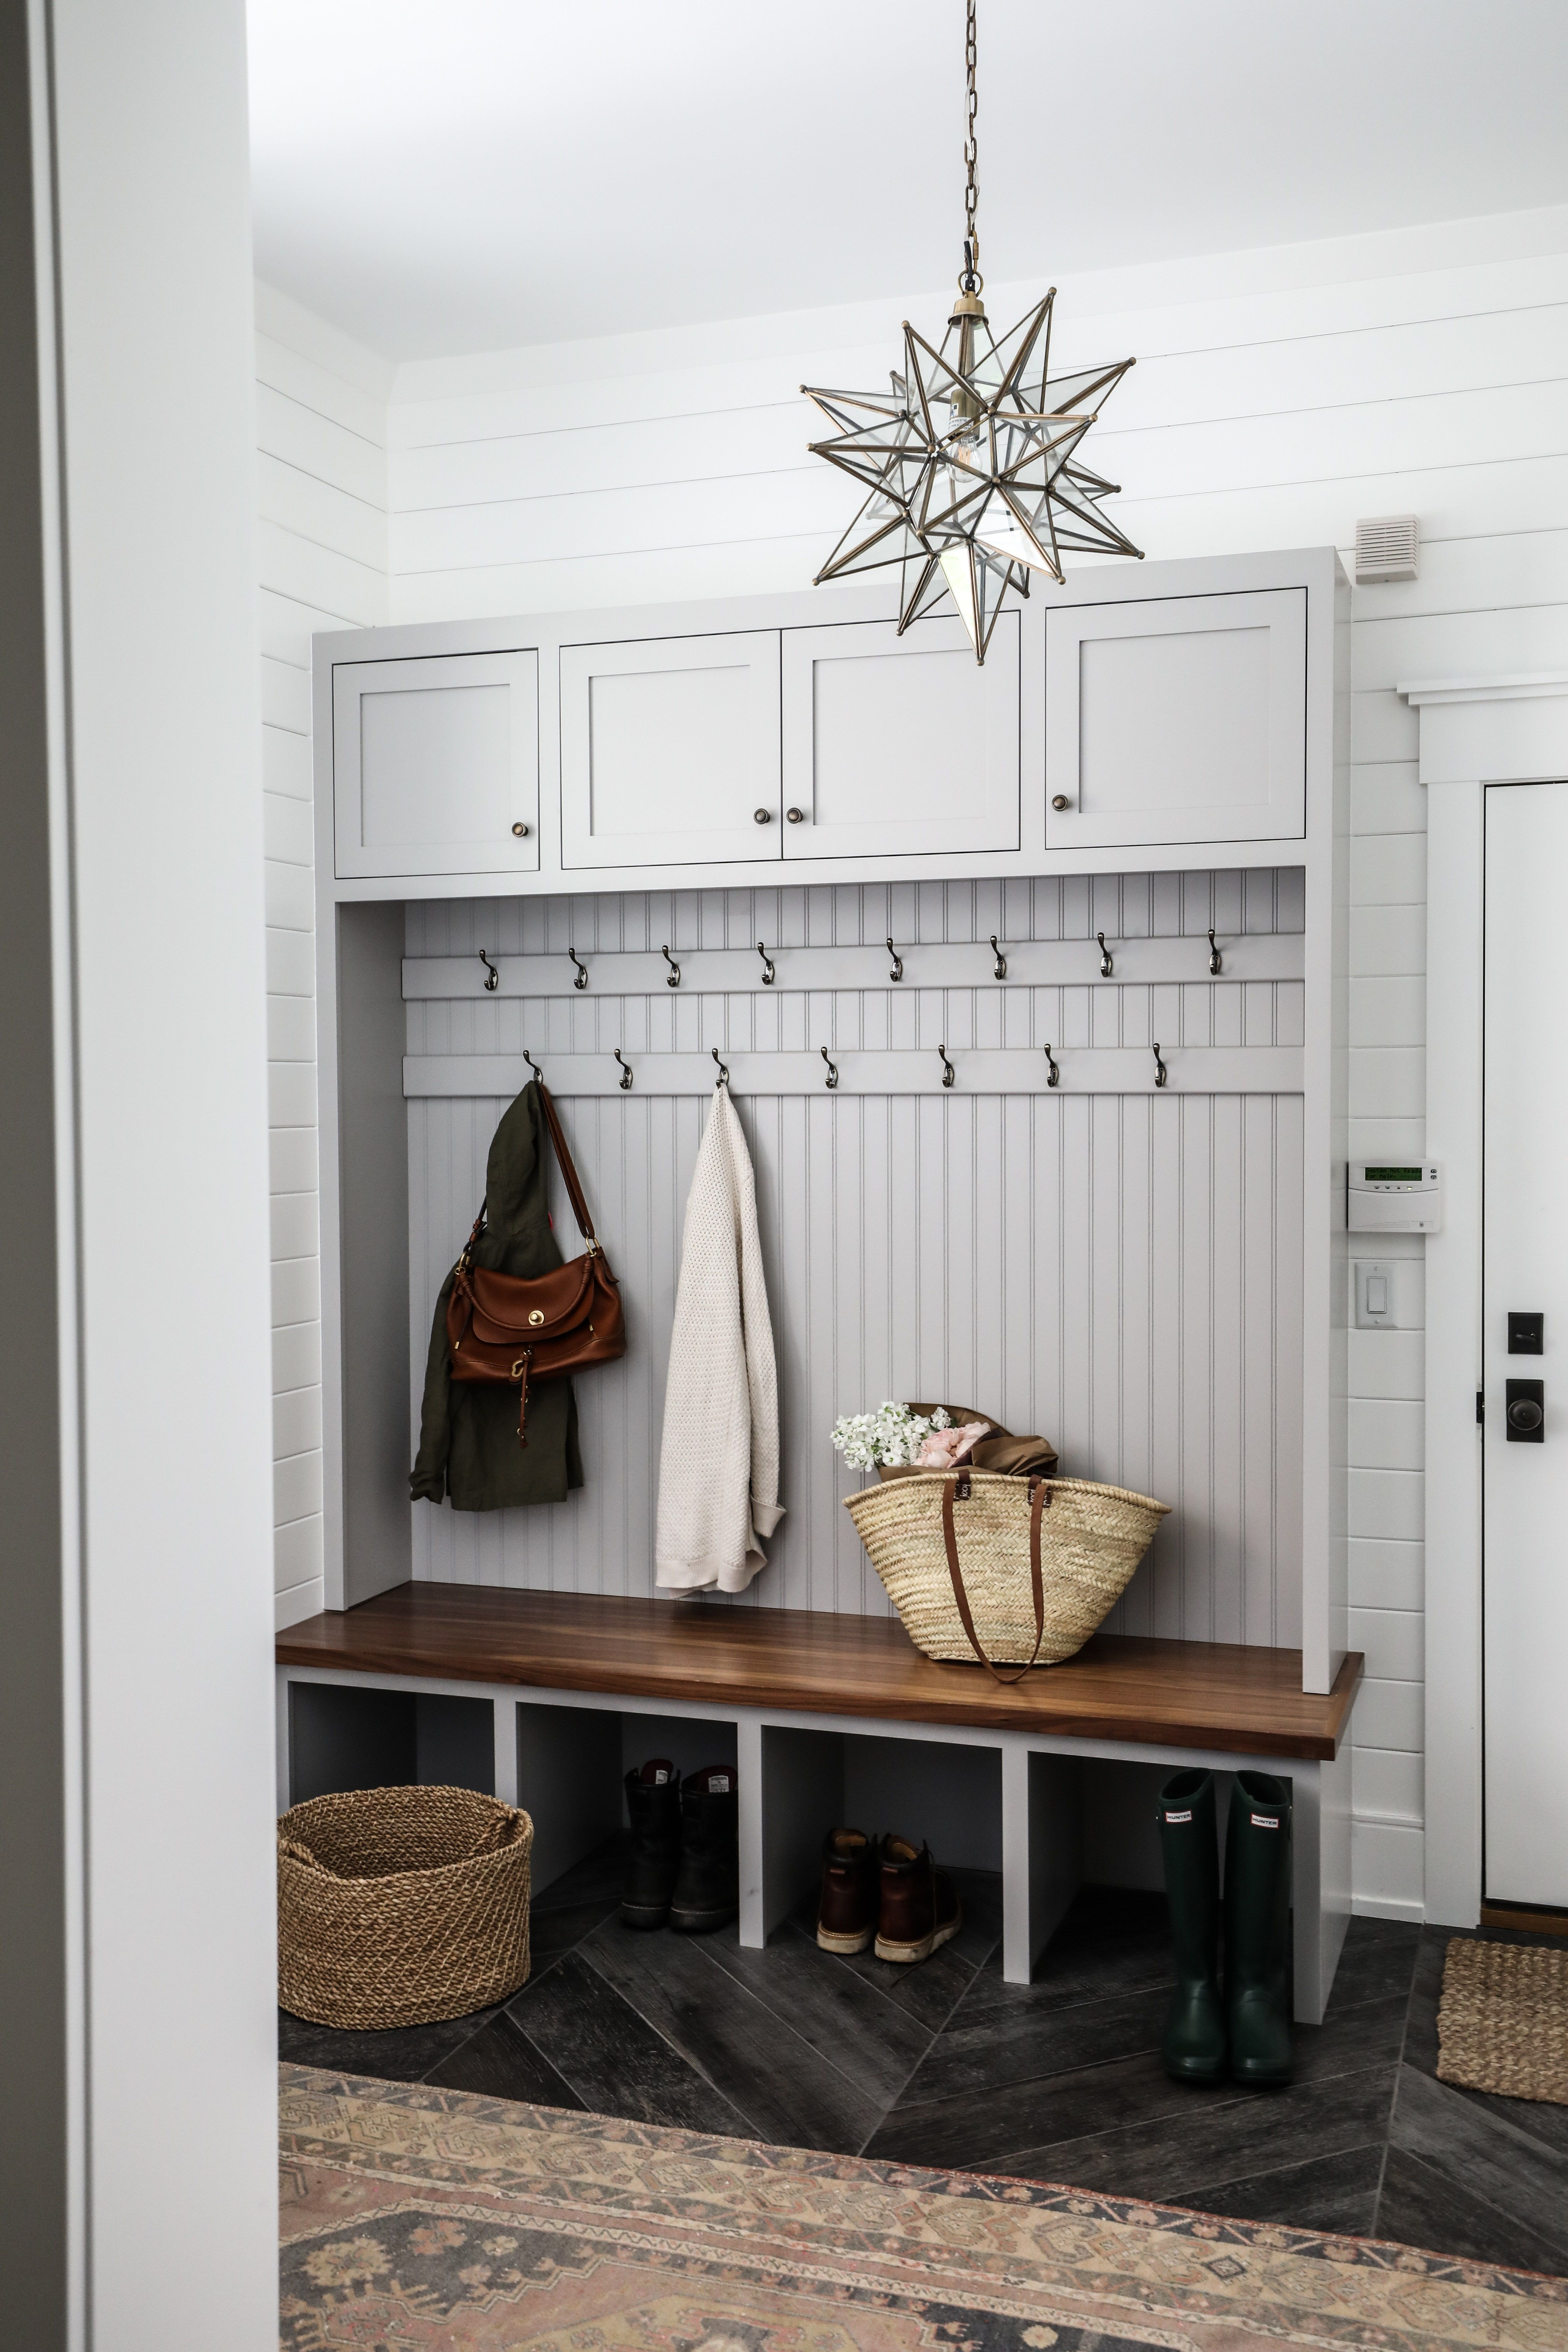 Home Interior Design Game Online: Entry & Mudroom - Park And Oak Interior Design